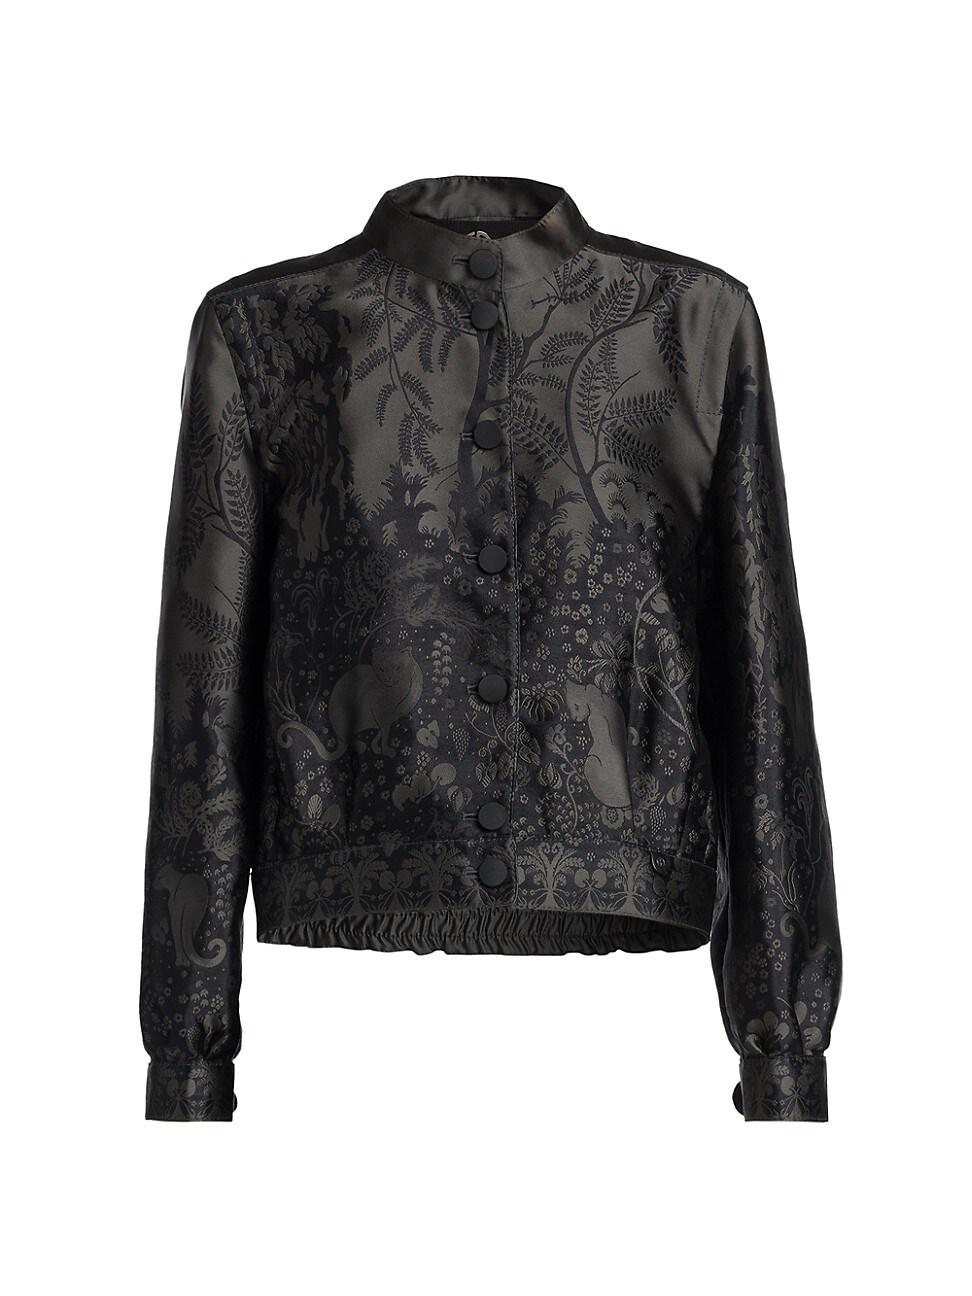 Giorgio Armani Jackets WOMEN'S JACQUARD BUTTON SILK-BLEND JACKET